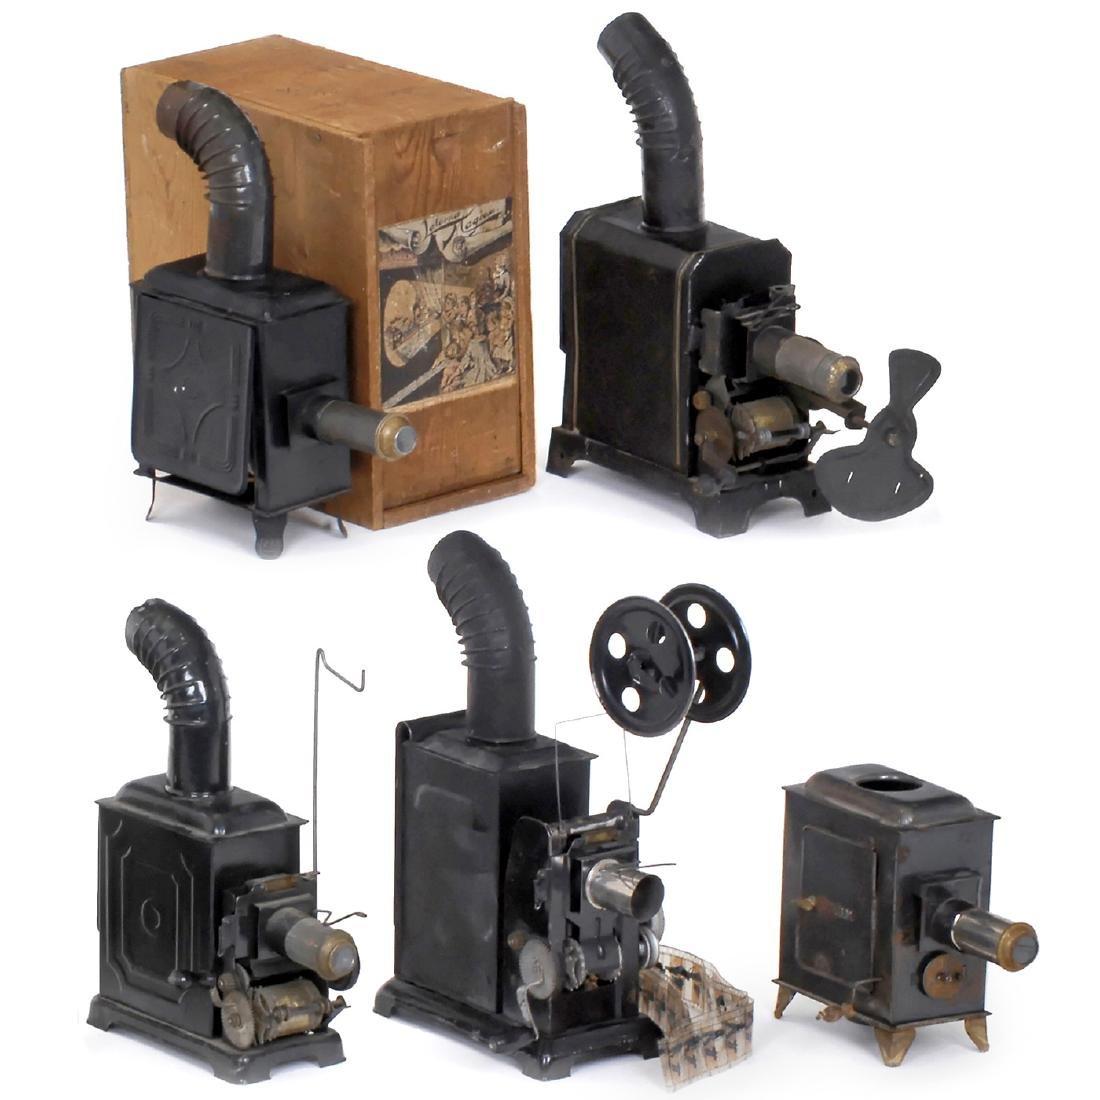 5 Cinematographs and Magic Lanterns, c. 1912